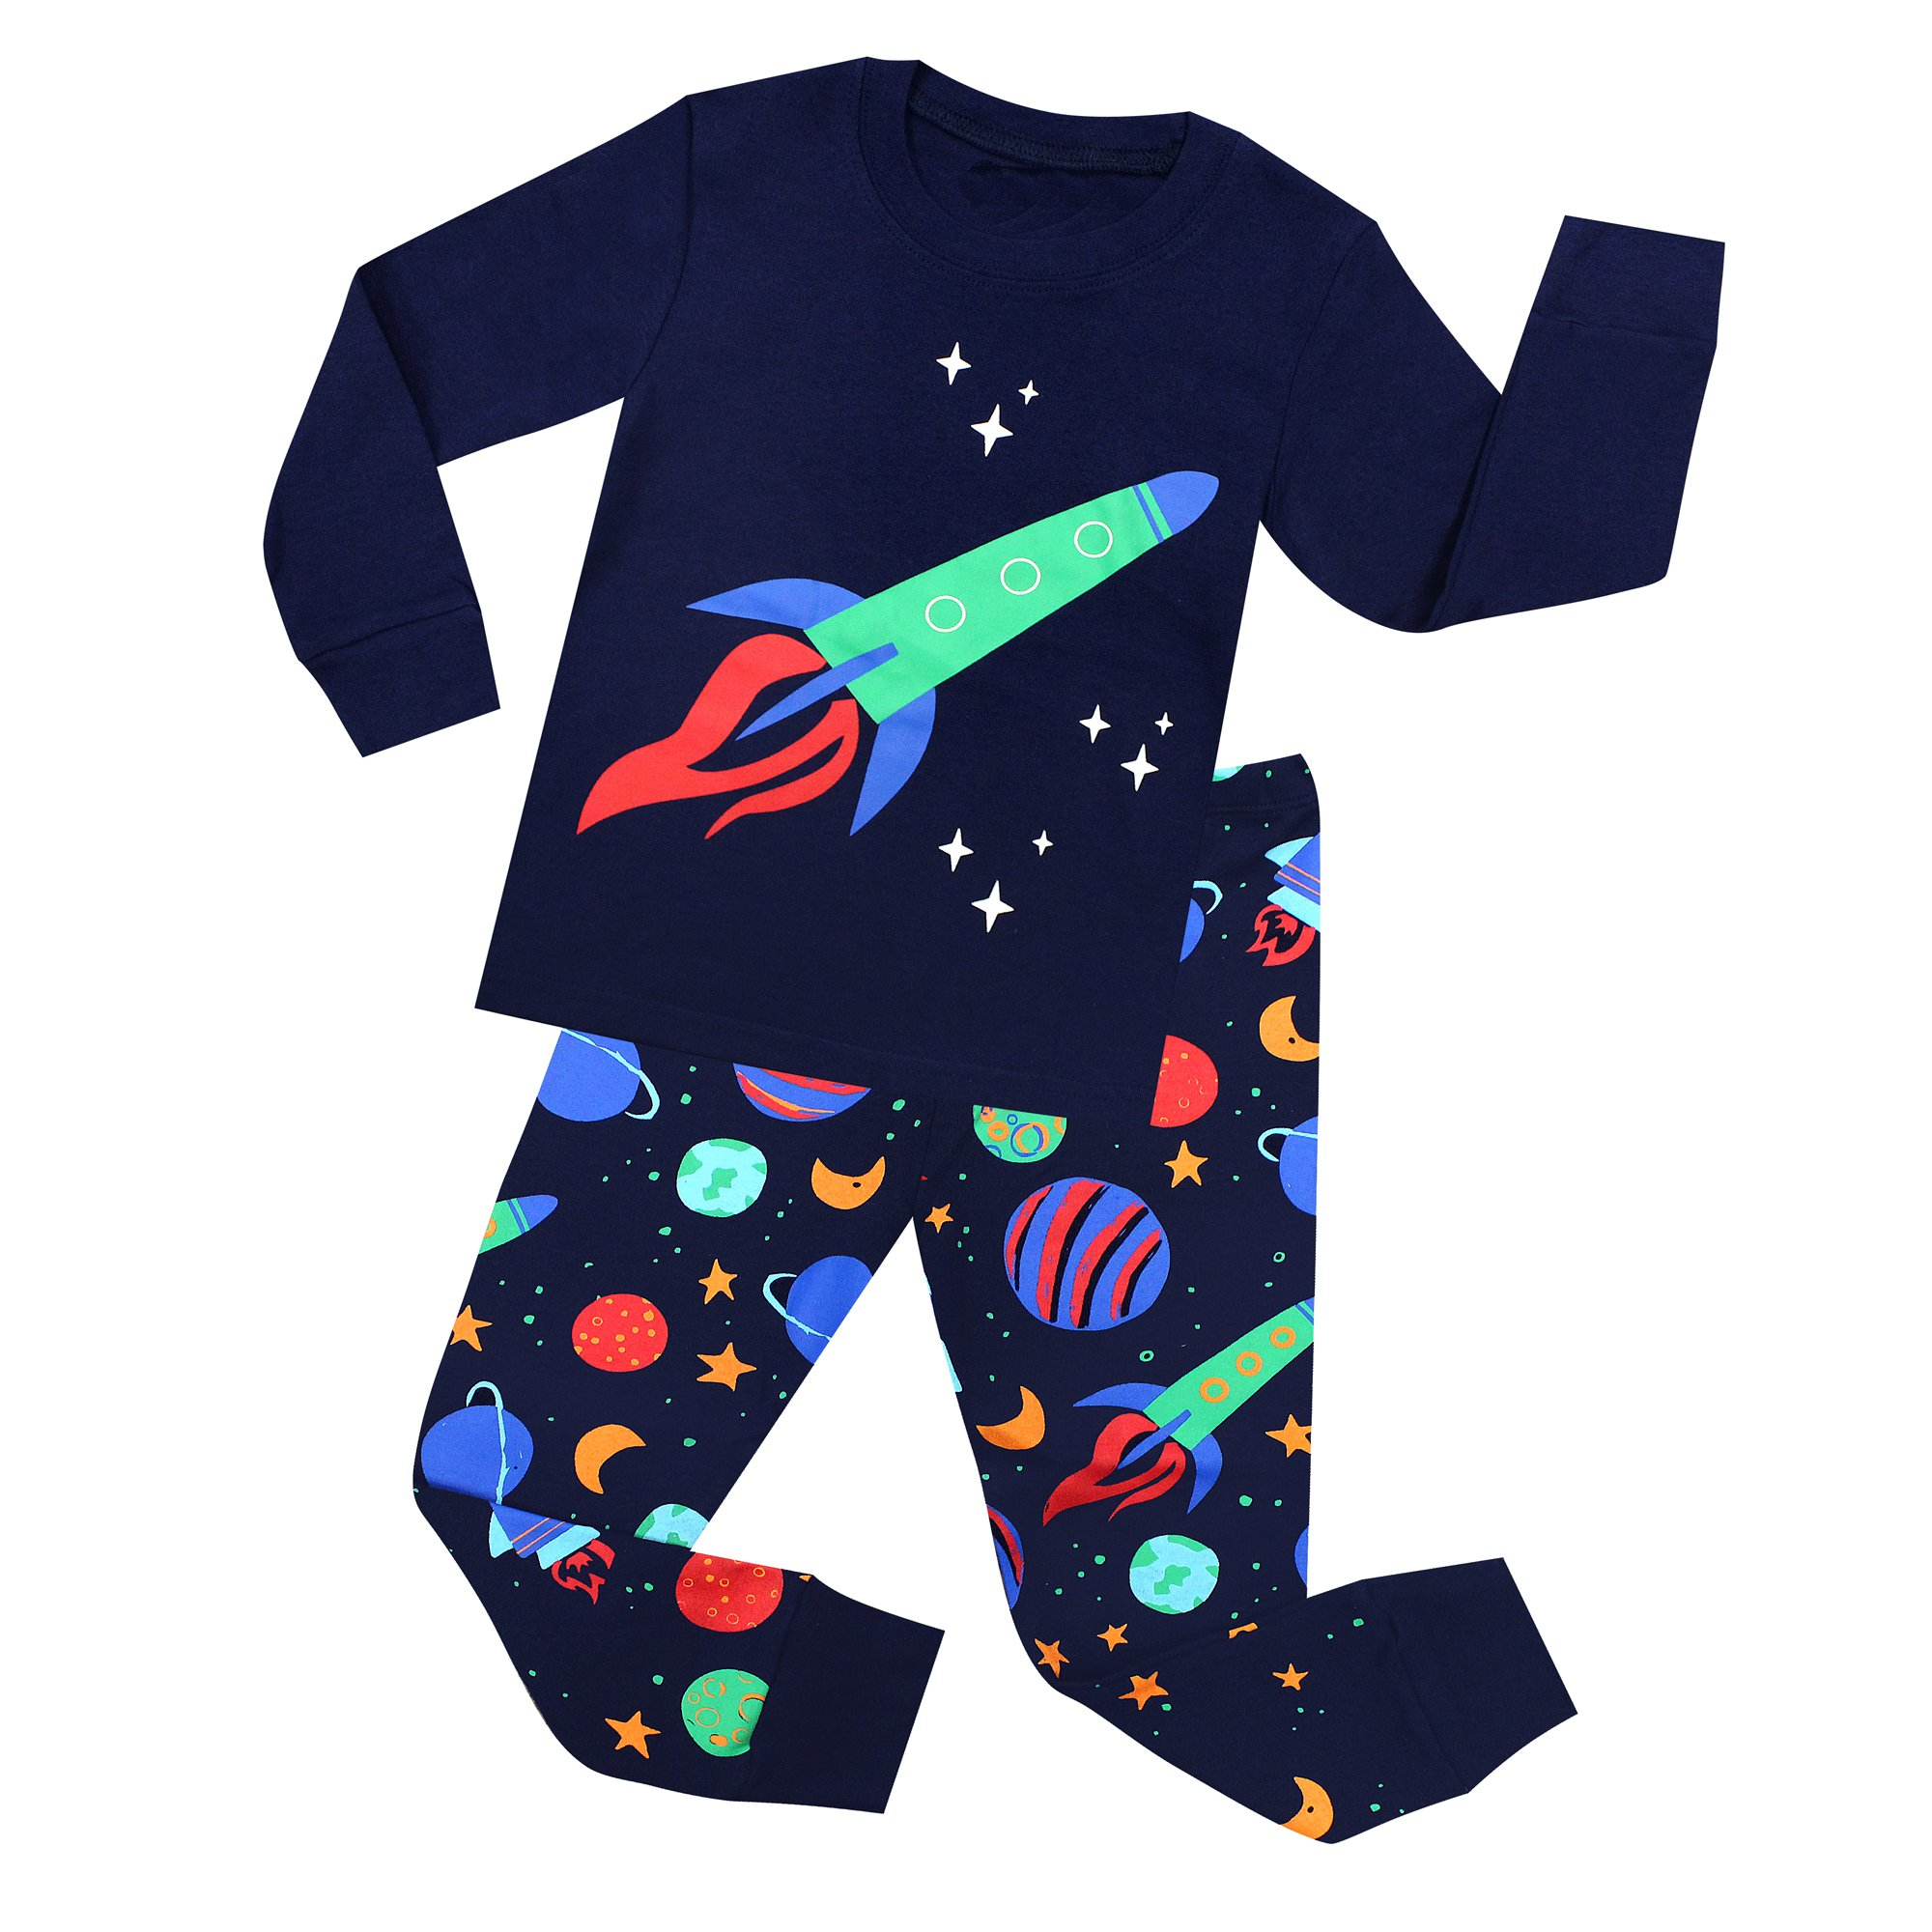 TinaLuLing Rockets Boys Pajamas 100 Cotton Rockets Pajama Pyjamas Children Kids Sleepwear for 2-8 Years (8 Years)